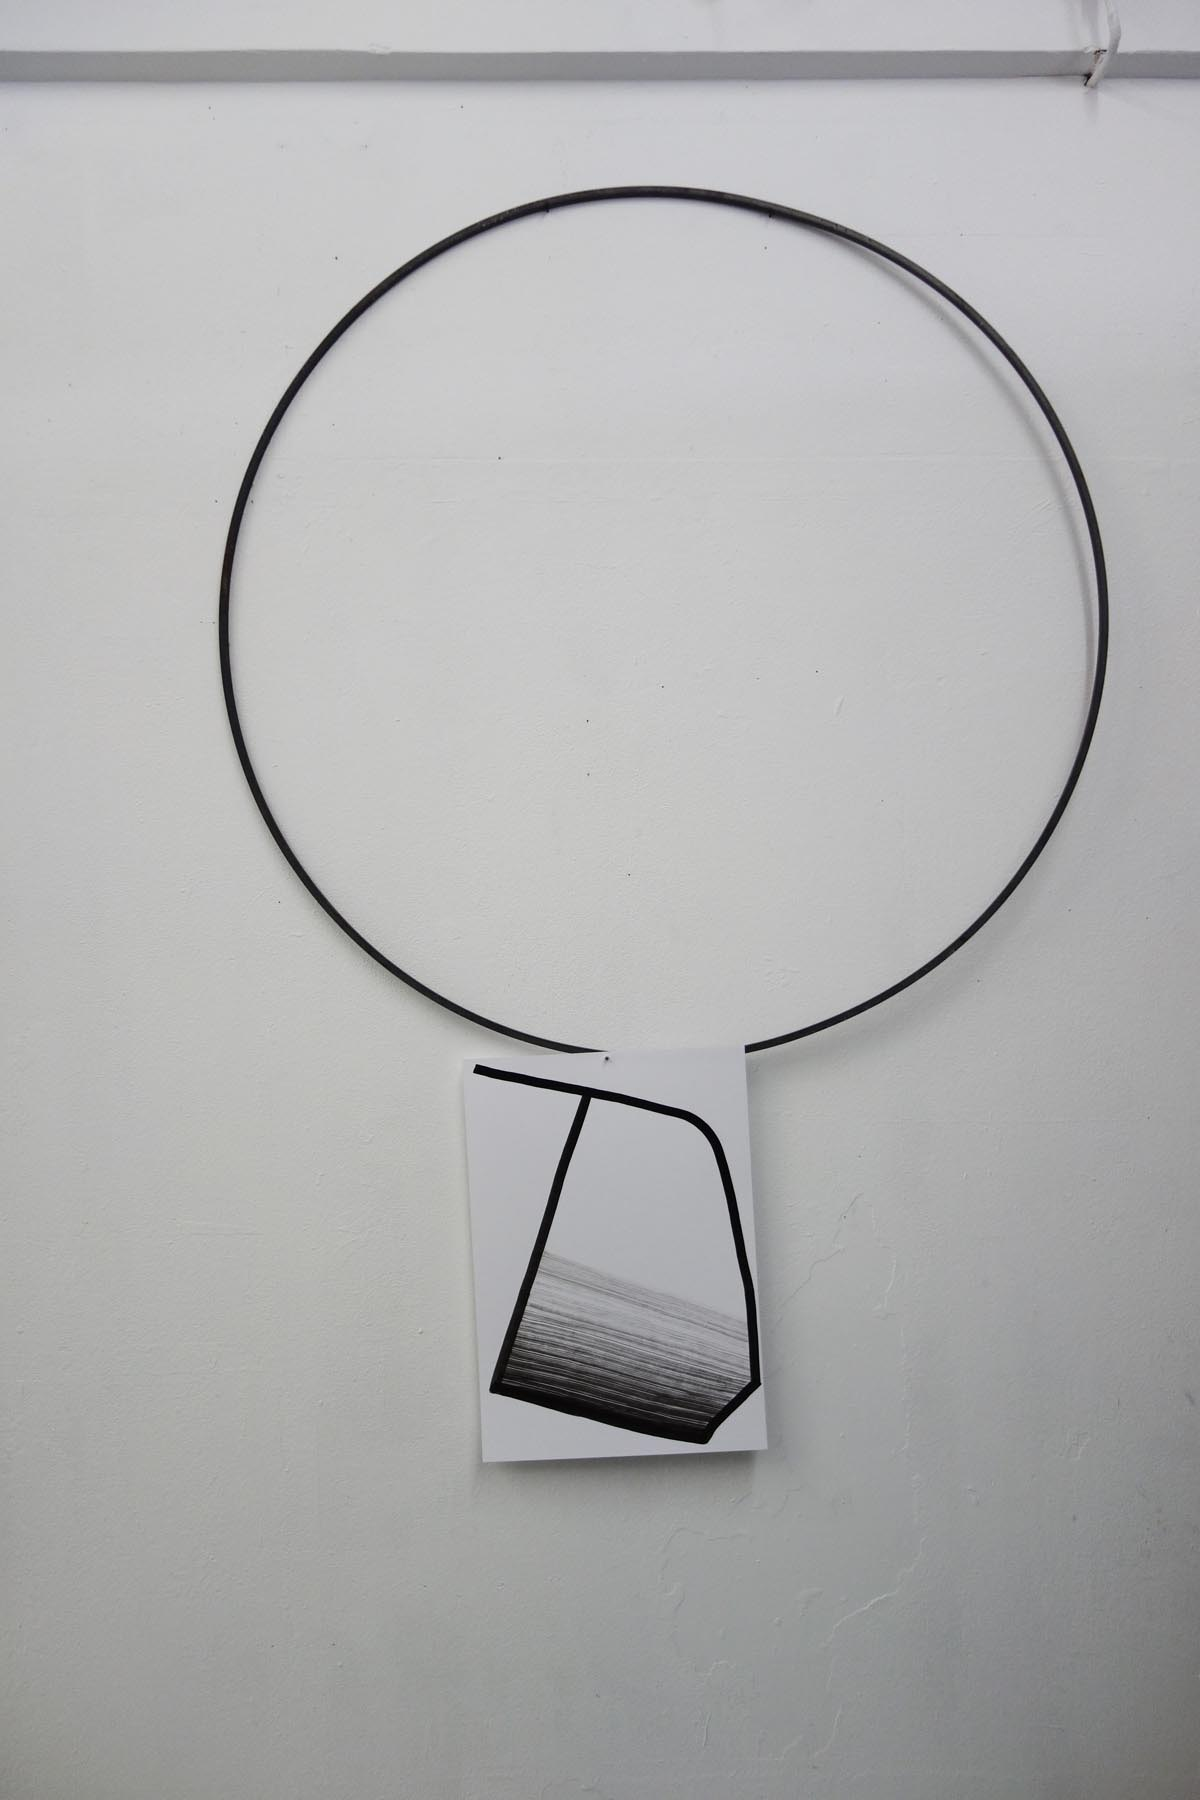 Nina Annabelle Maerkl, Permeable Entities, 2016, Installation view, Artothek Munich: Drawings: Ink on paper, cutouts Objects: Glass, polished steel, wood. Size flexible.